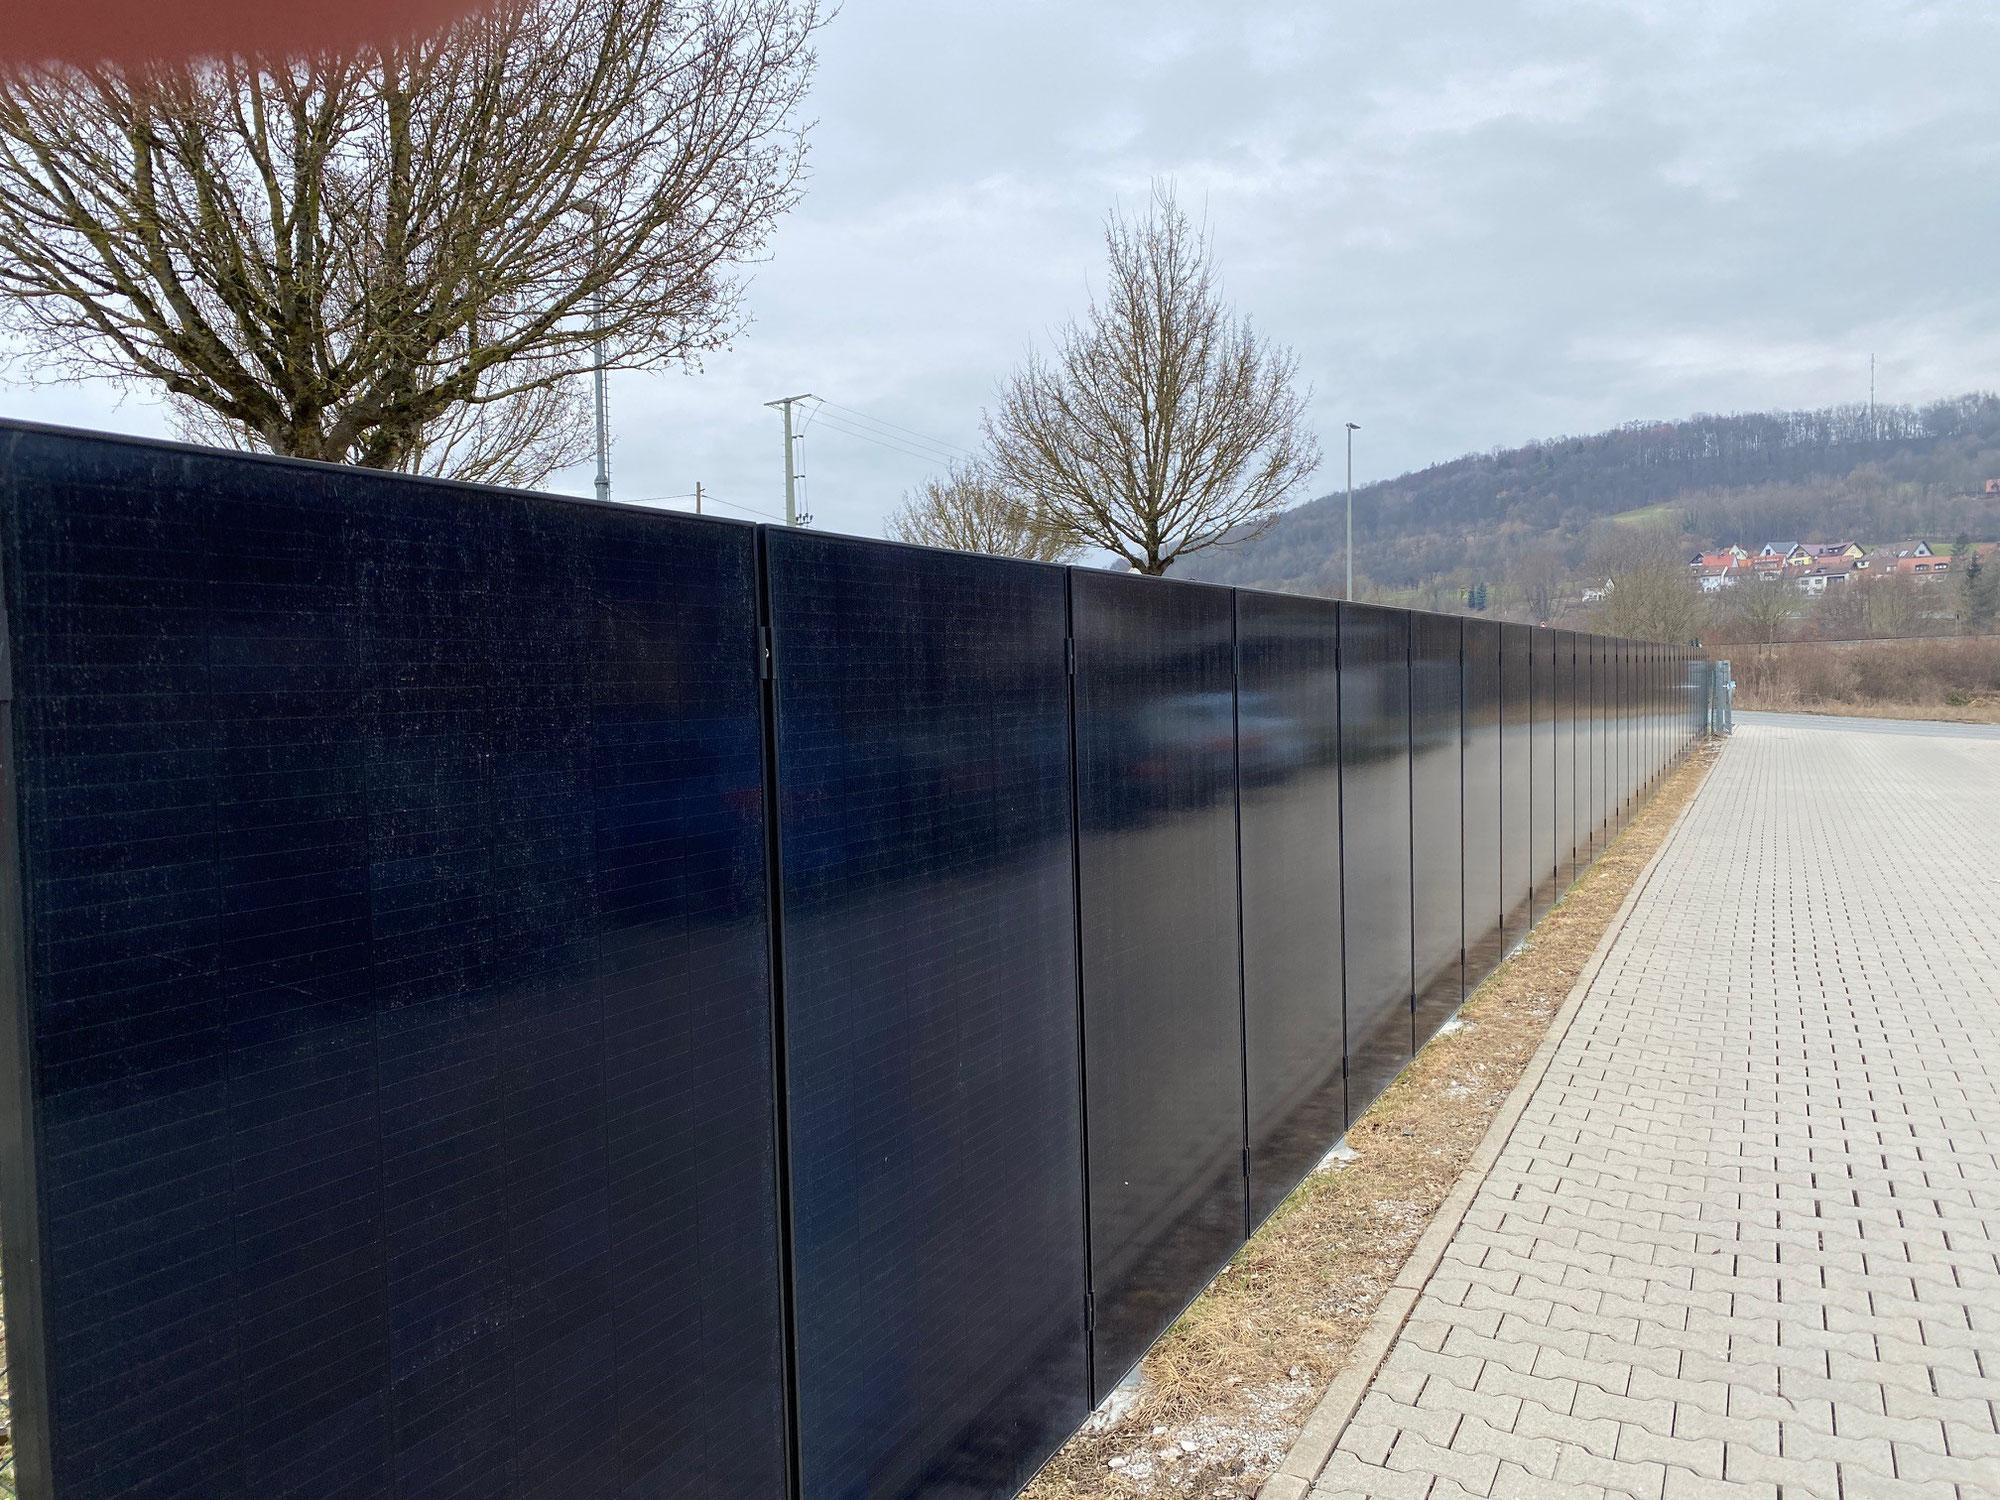 Freifeldanlage - Solarzaun - Agro-Photovoltaik